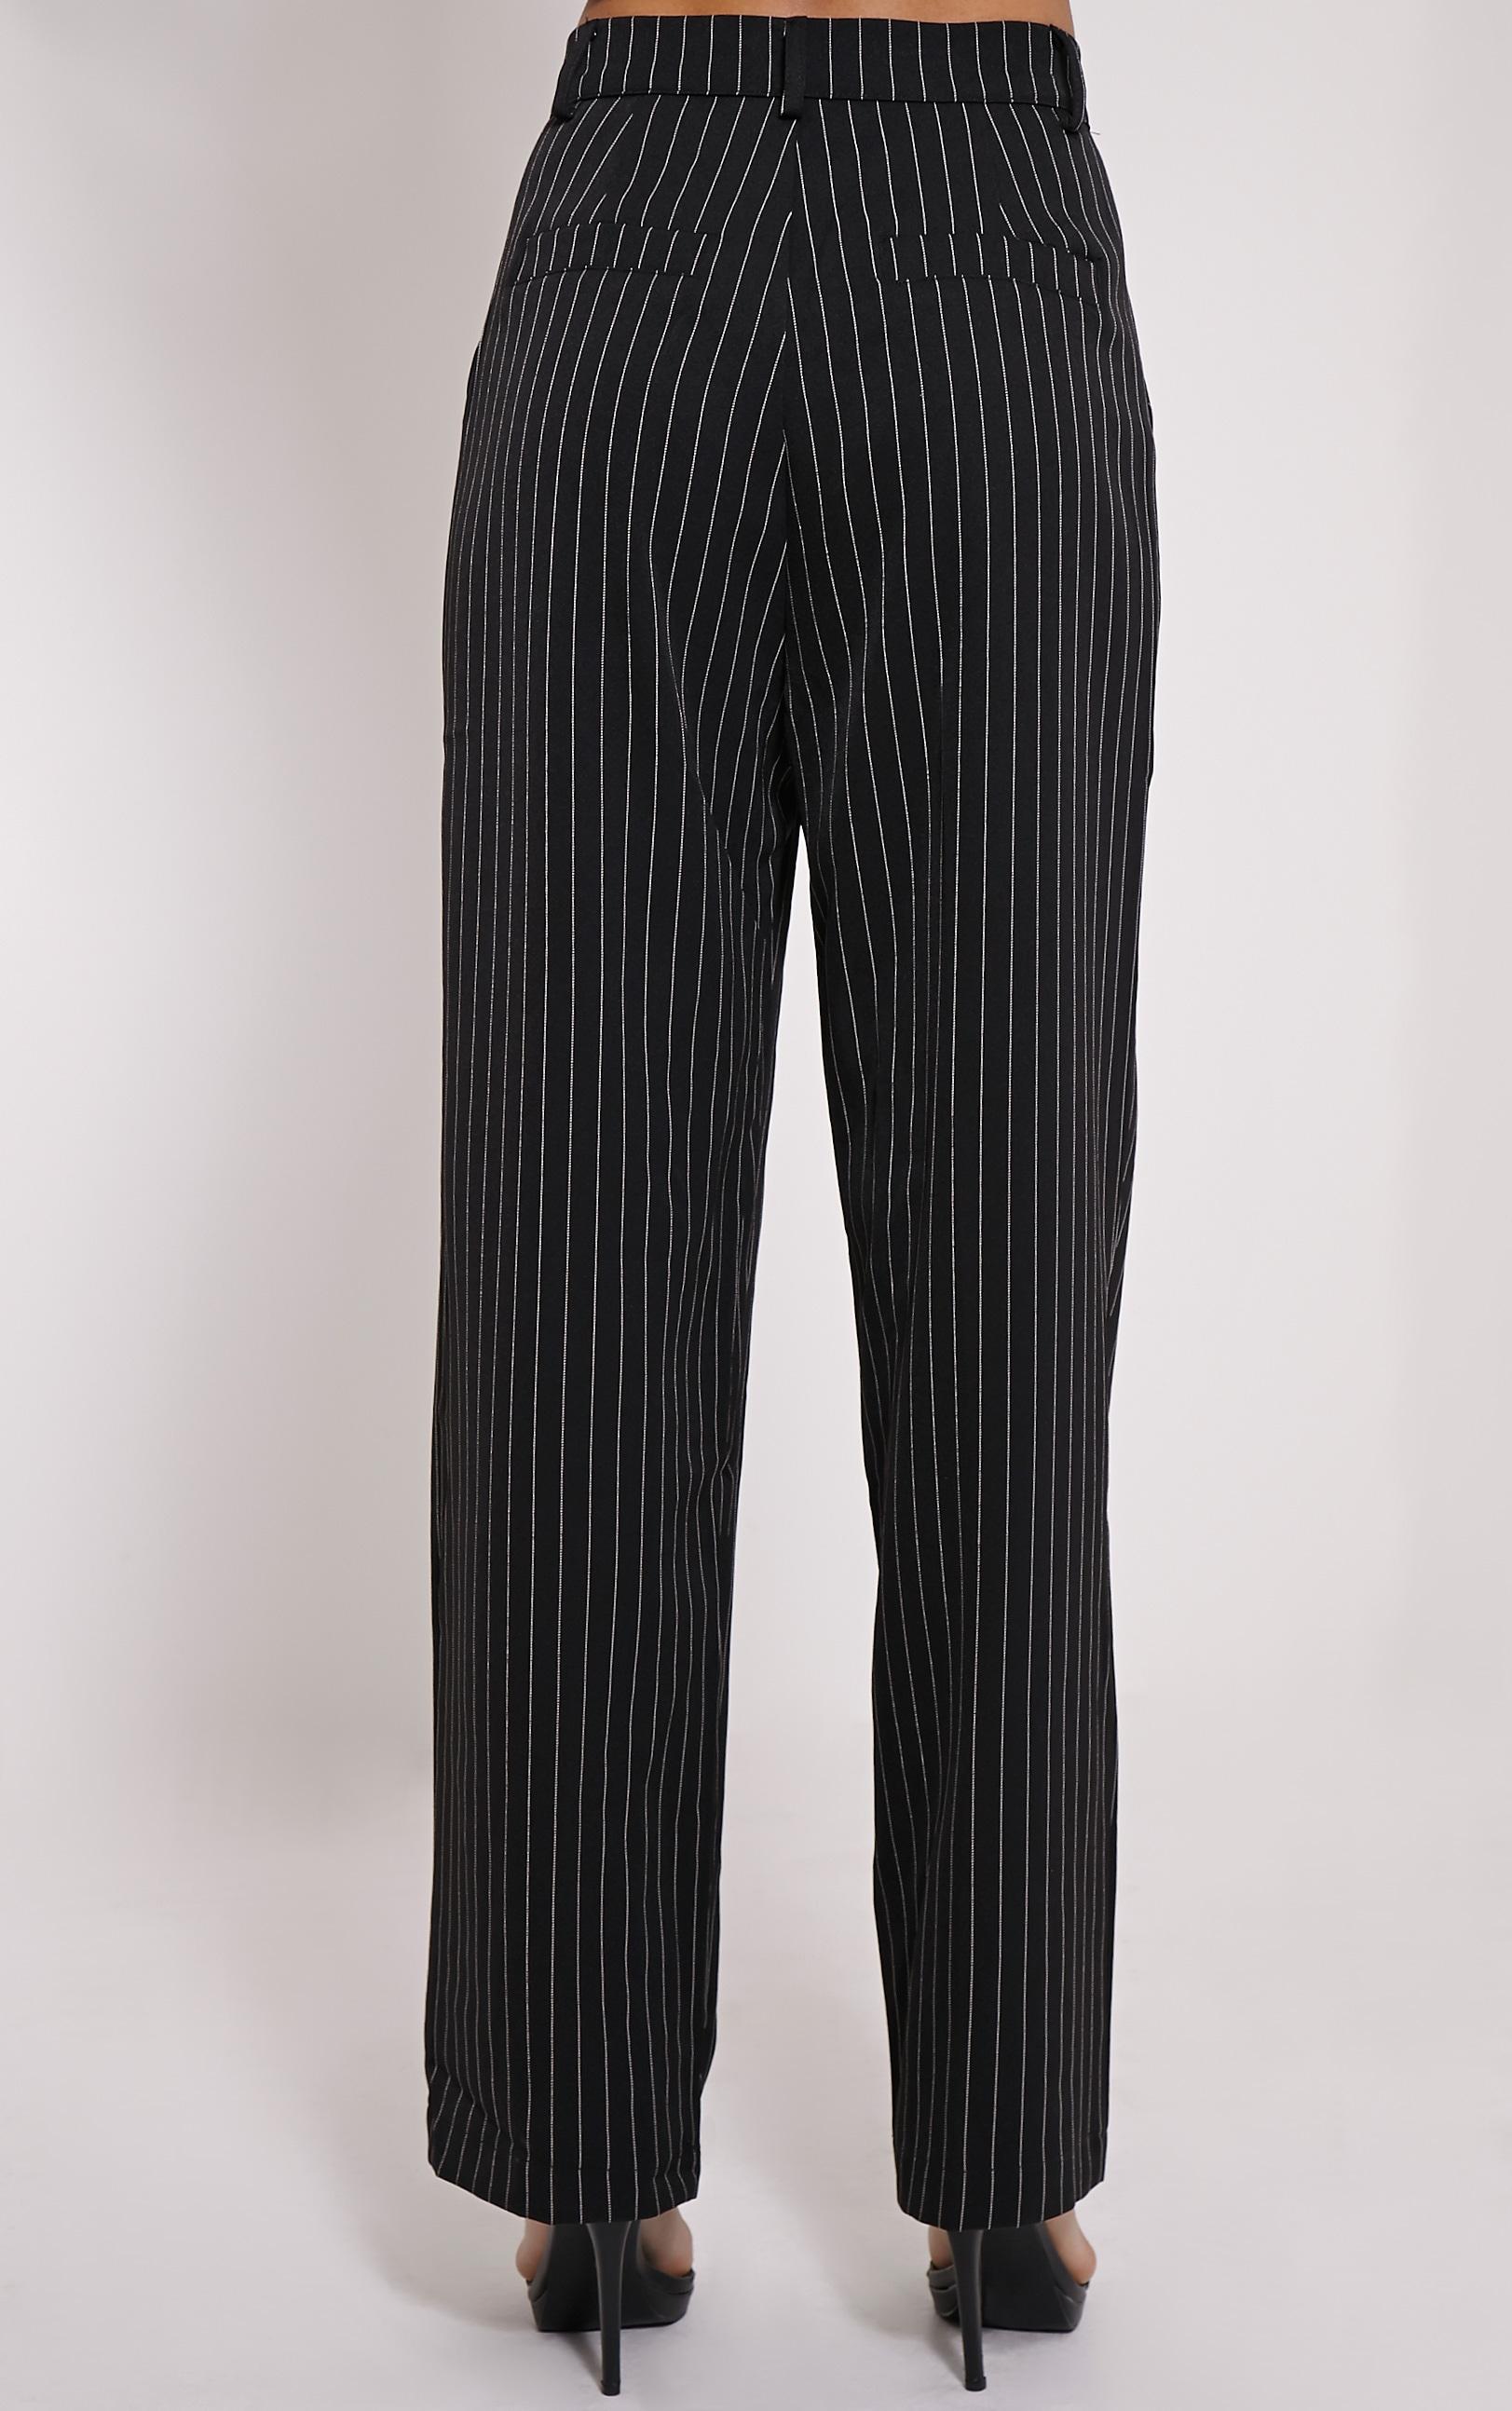 Adalyn Black Pinstripe Wide Leg Trousers 4